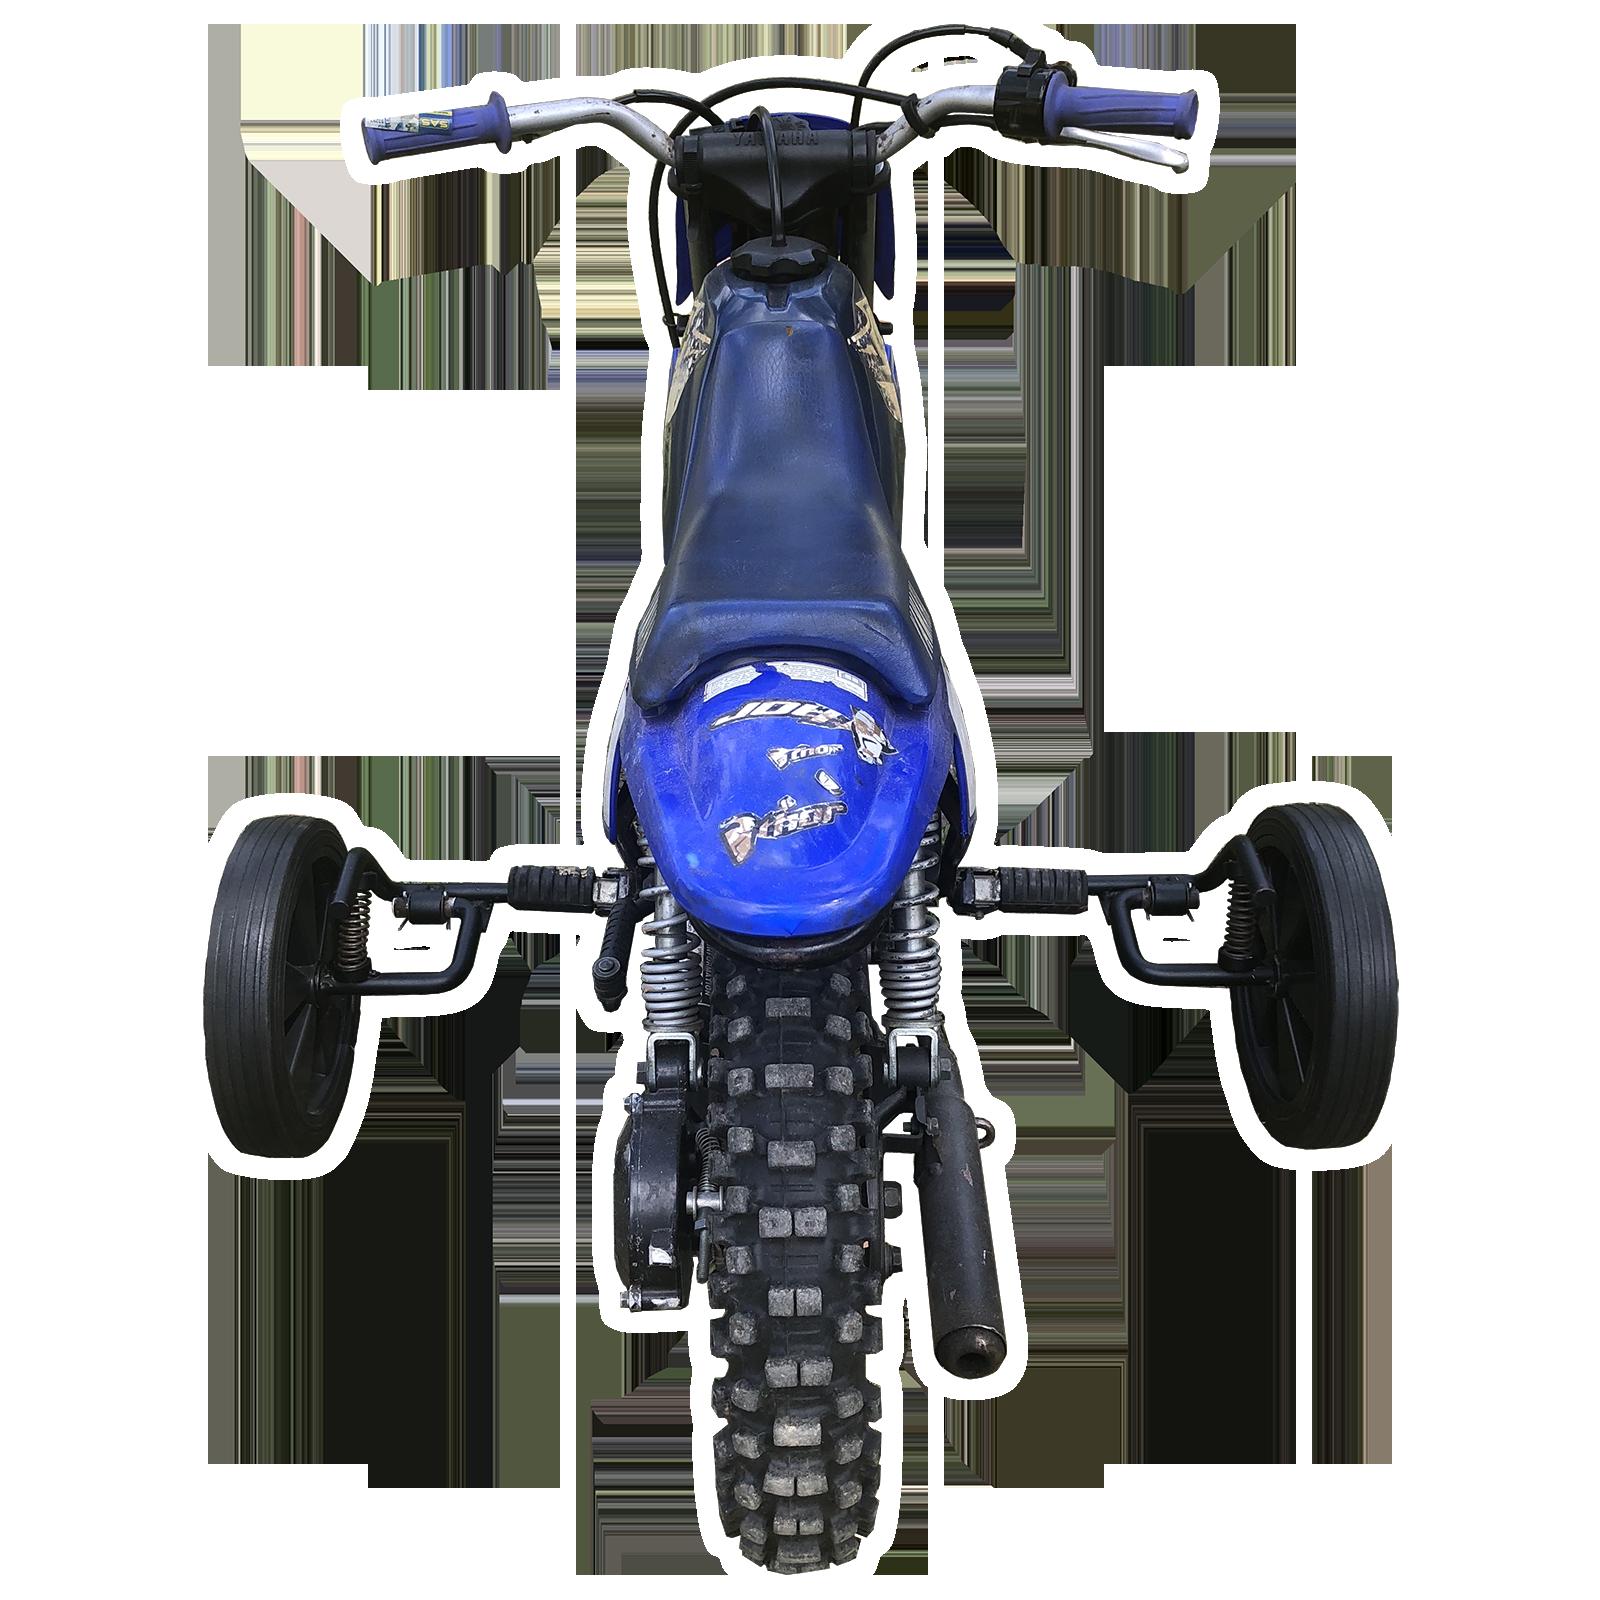 suspension axle yamaha pw 50 springers training wheels. Black Bedroom Furniture Sets. Home Design Ideas